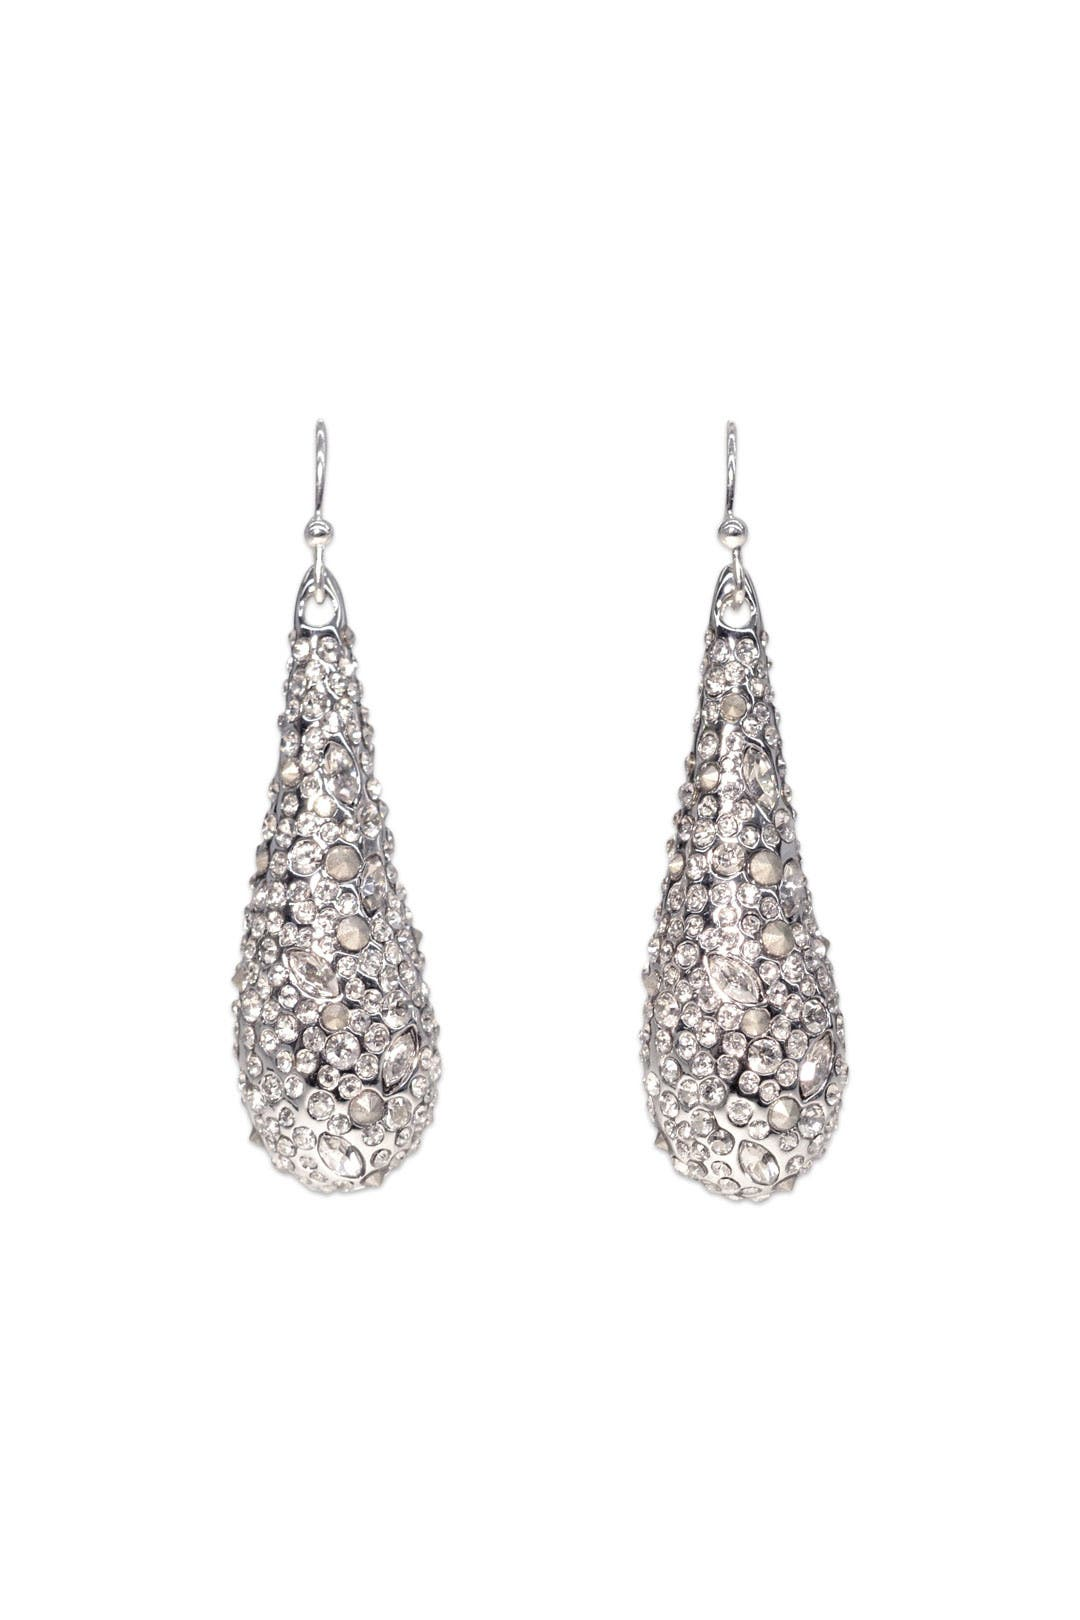 Silver Pave Teardrop Earring by Alexis Bittar